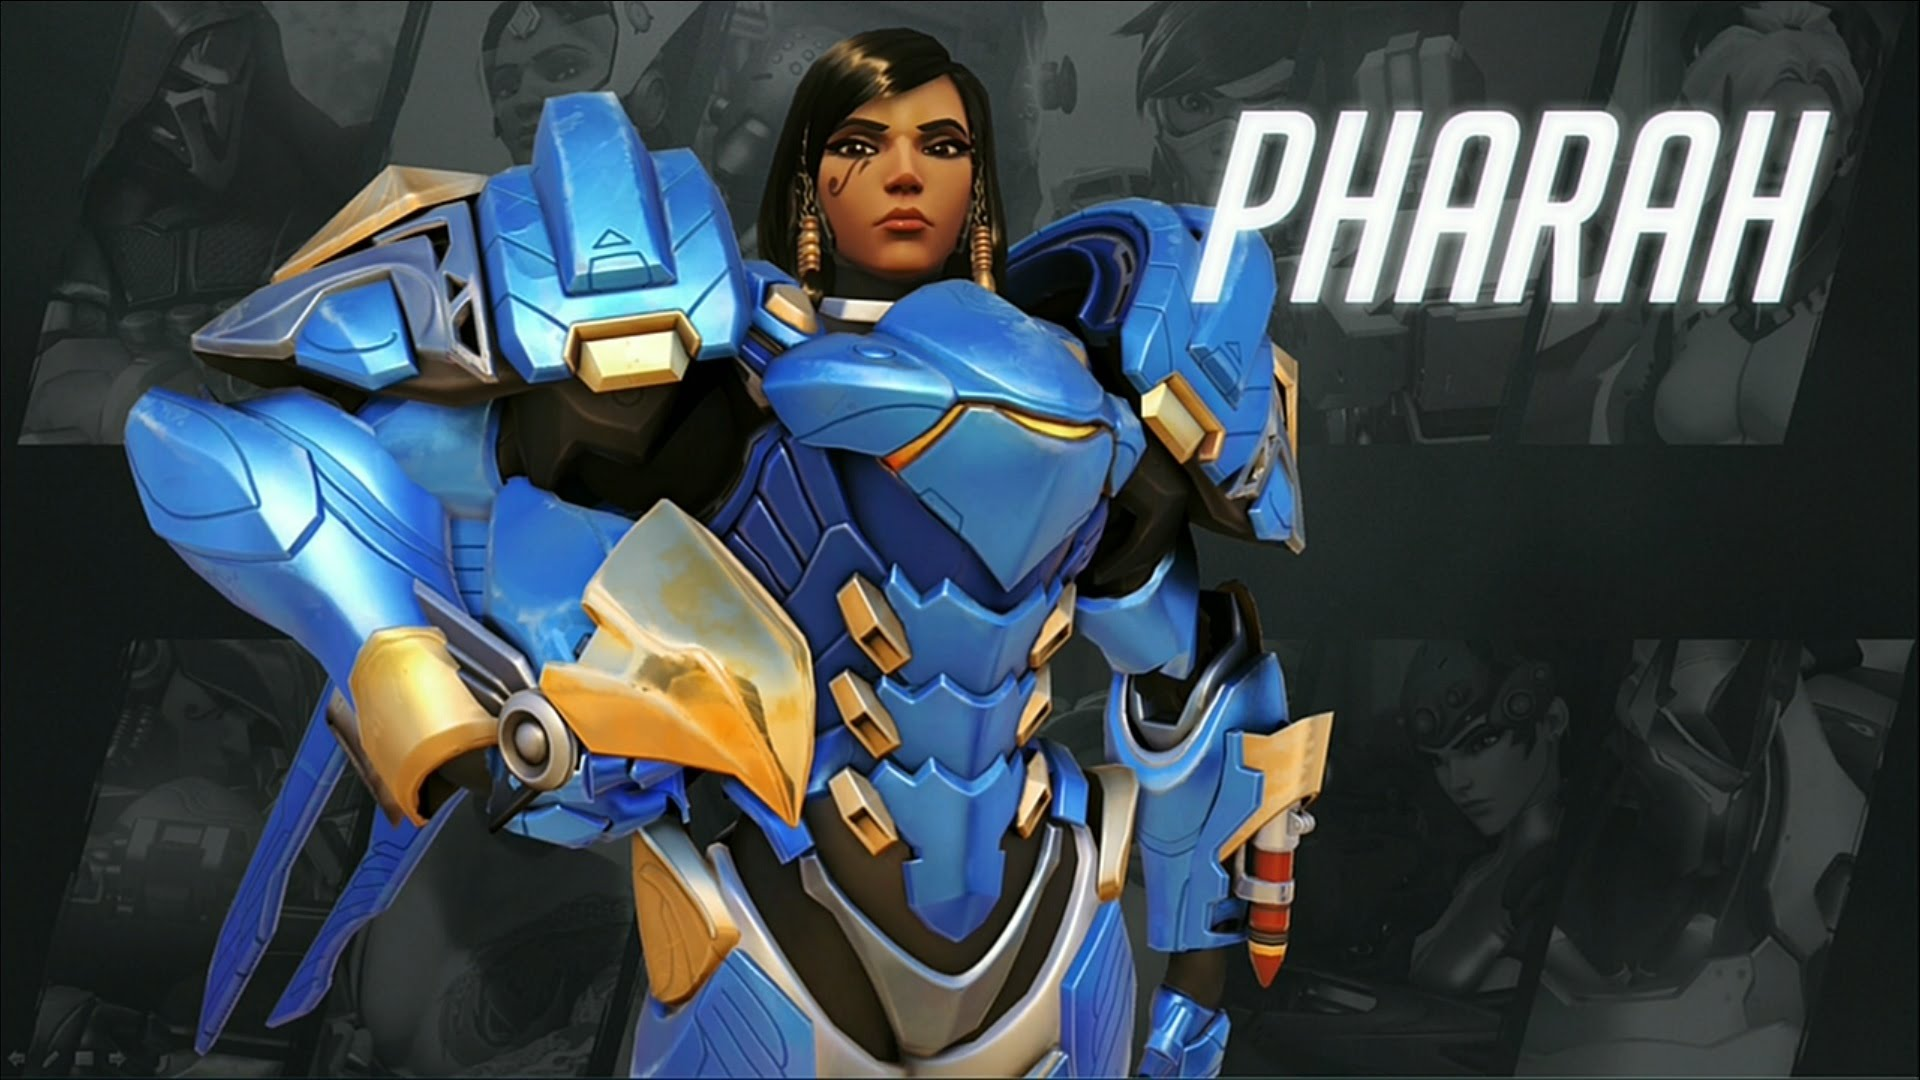 Overwatch : Pharah Download